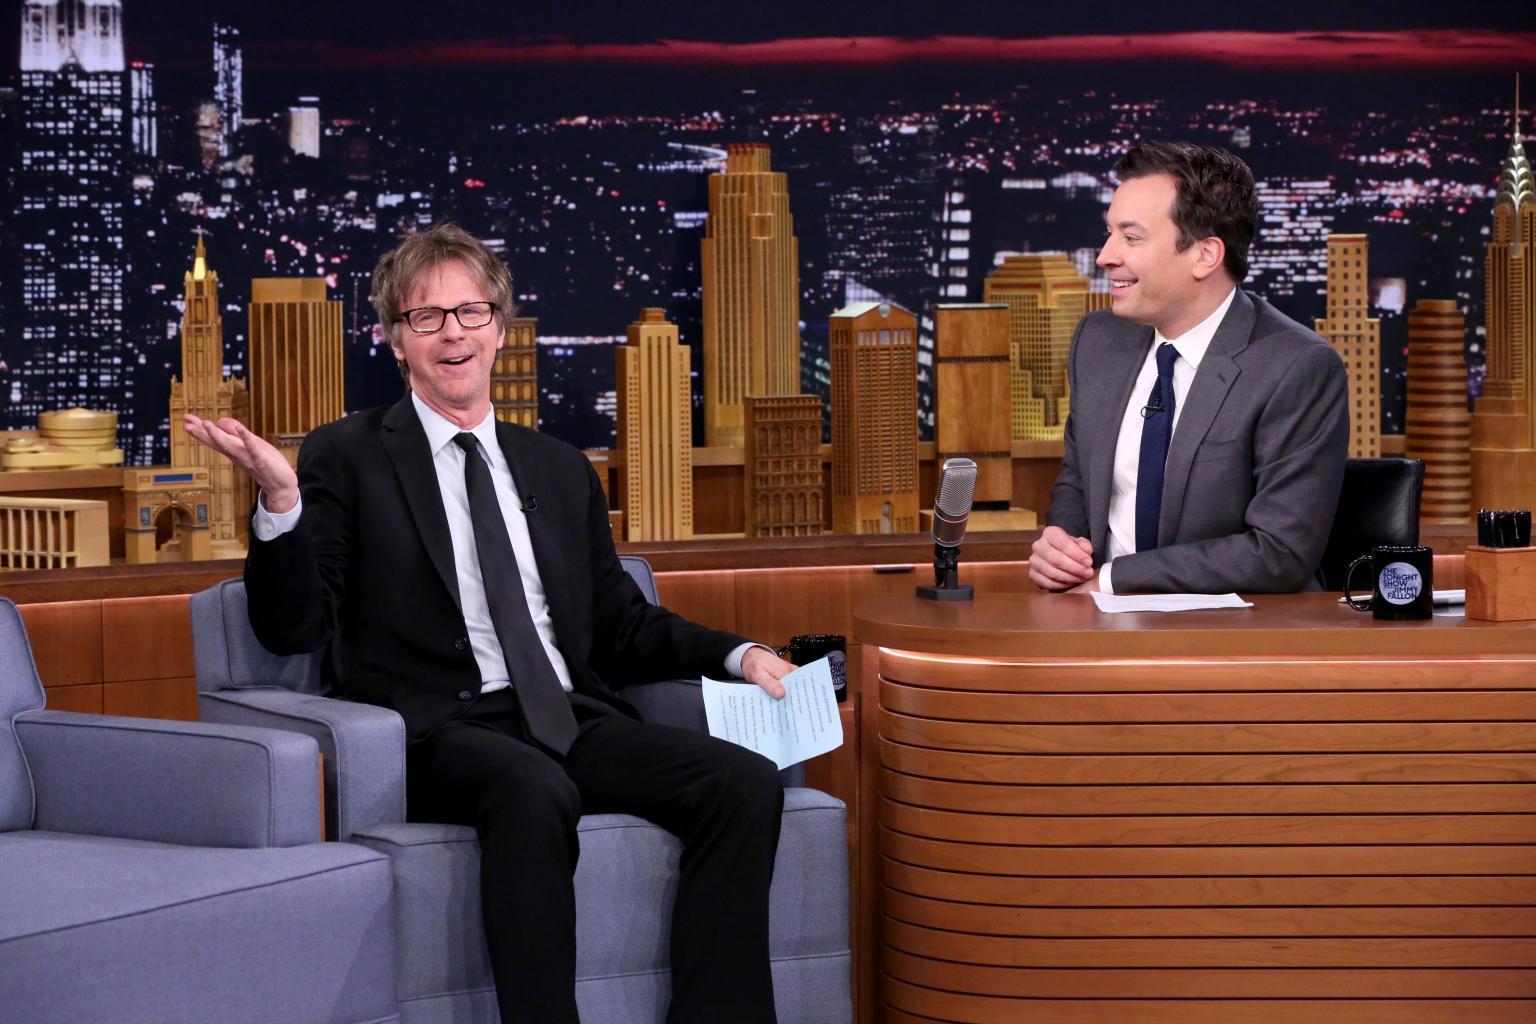 Dana Carvey Kills With    Micro-Impressions '  Of Trump, Pacino      And Jimmy Fallon      On    Tonight